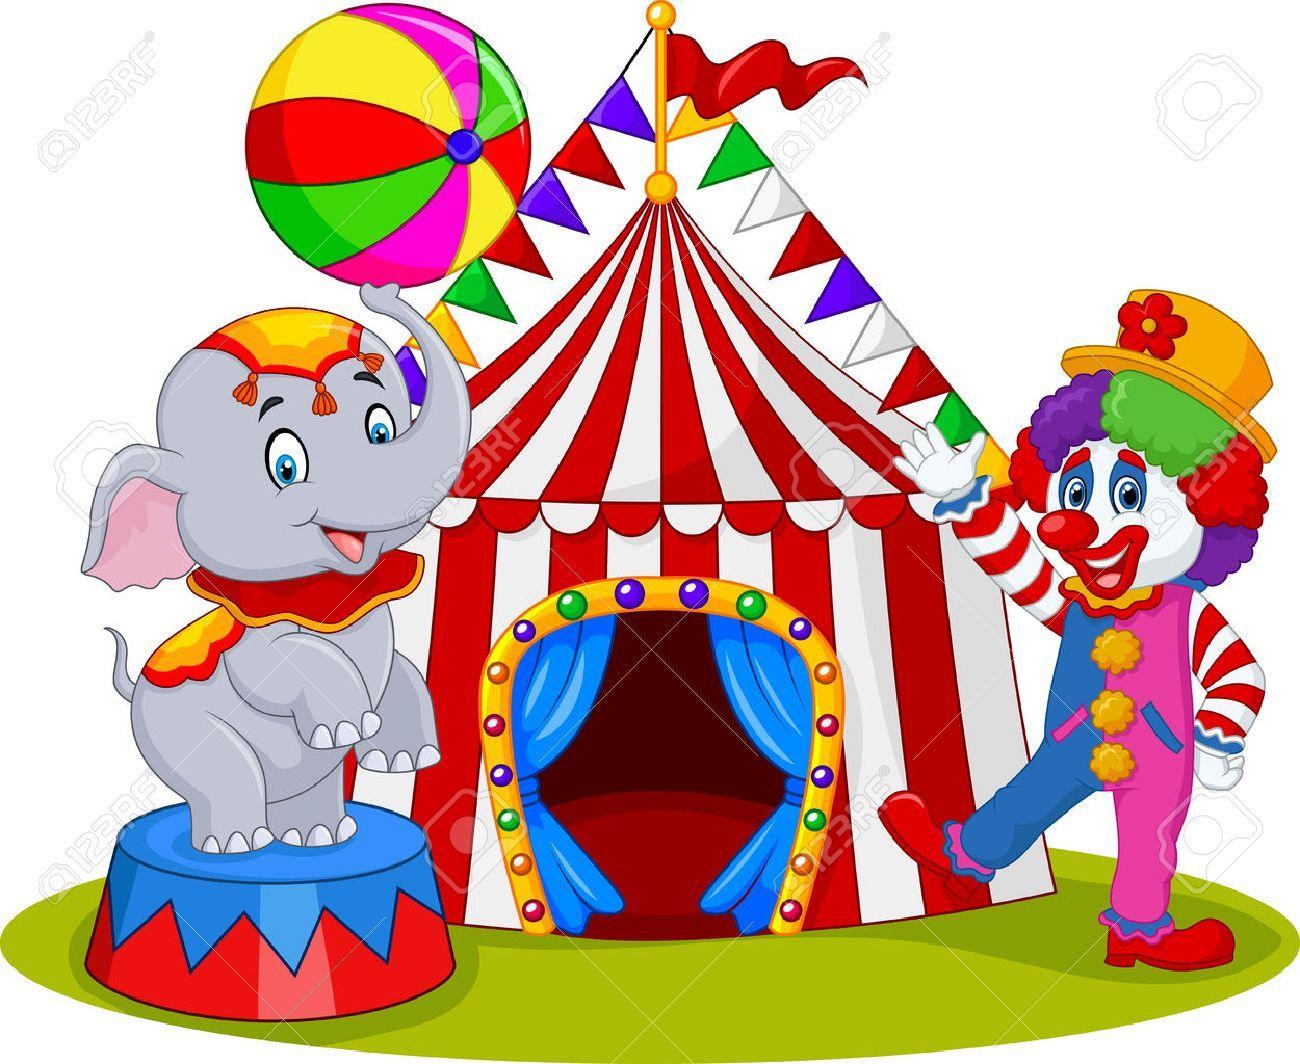 Carnival clown clipart 4 » Clipart Portal.